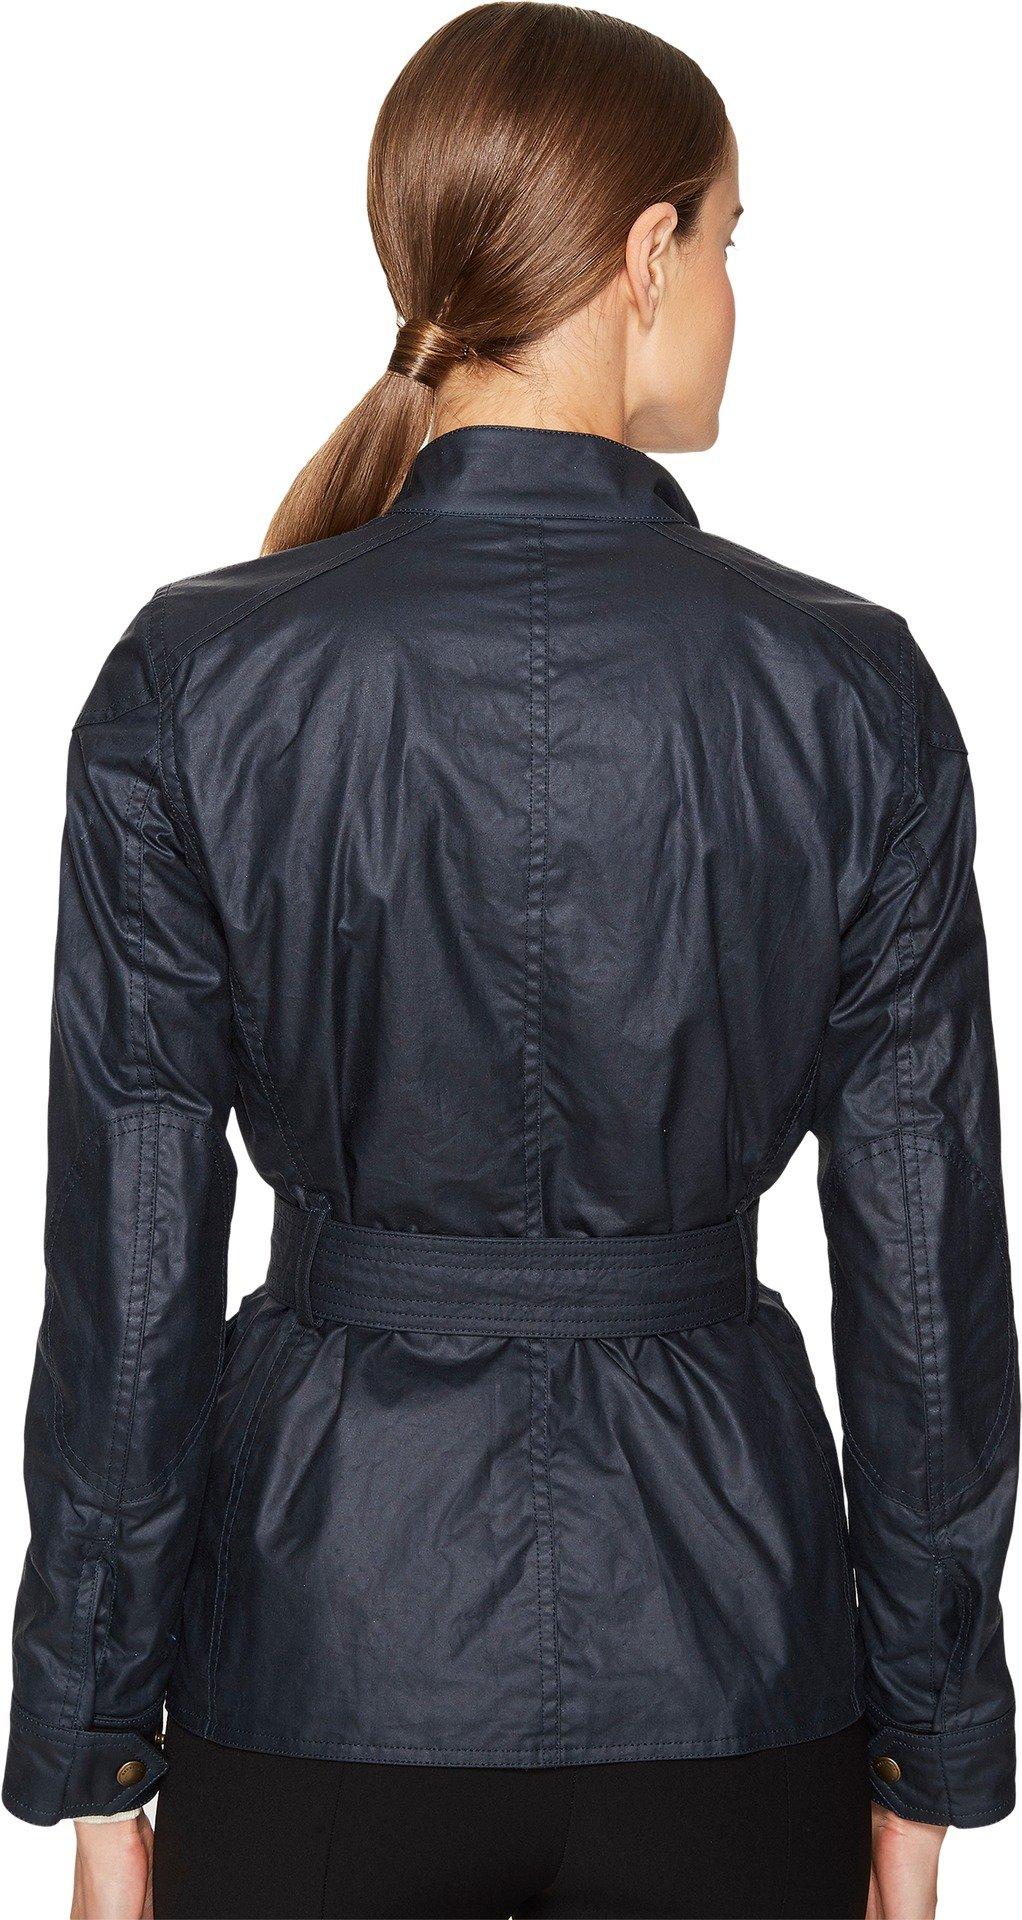 BELSTAFF Women's Roadmaster 2.0 Signature 6 Oz. Wax Cotton Jacket Dark Teal 44 by Belstaff (Image #3)